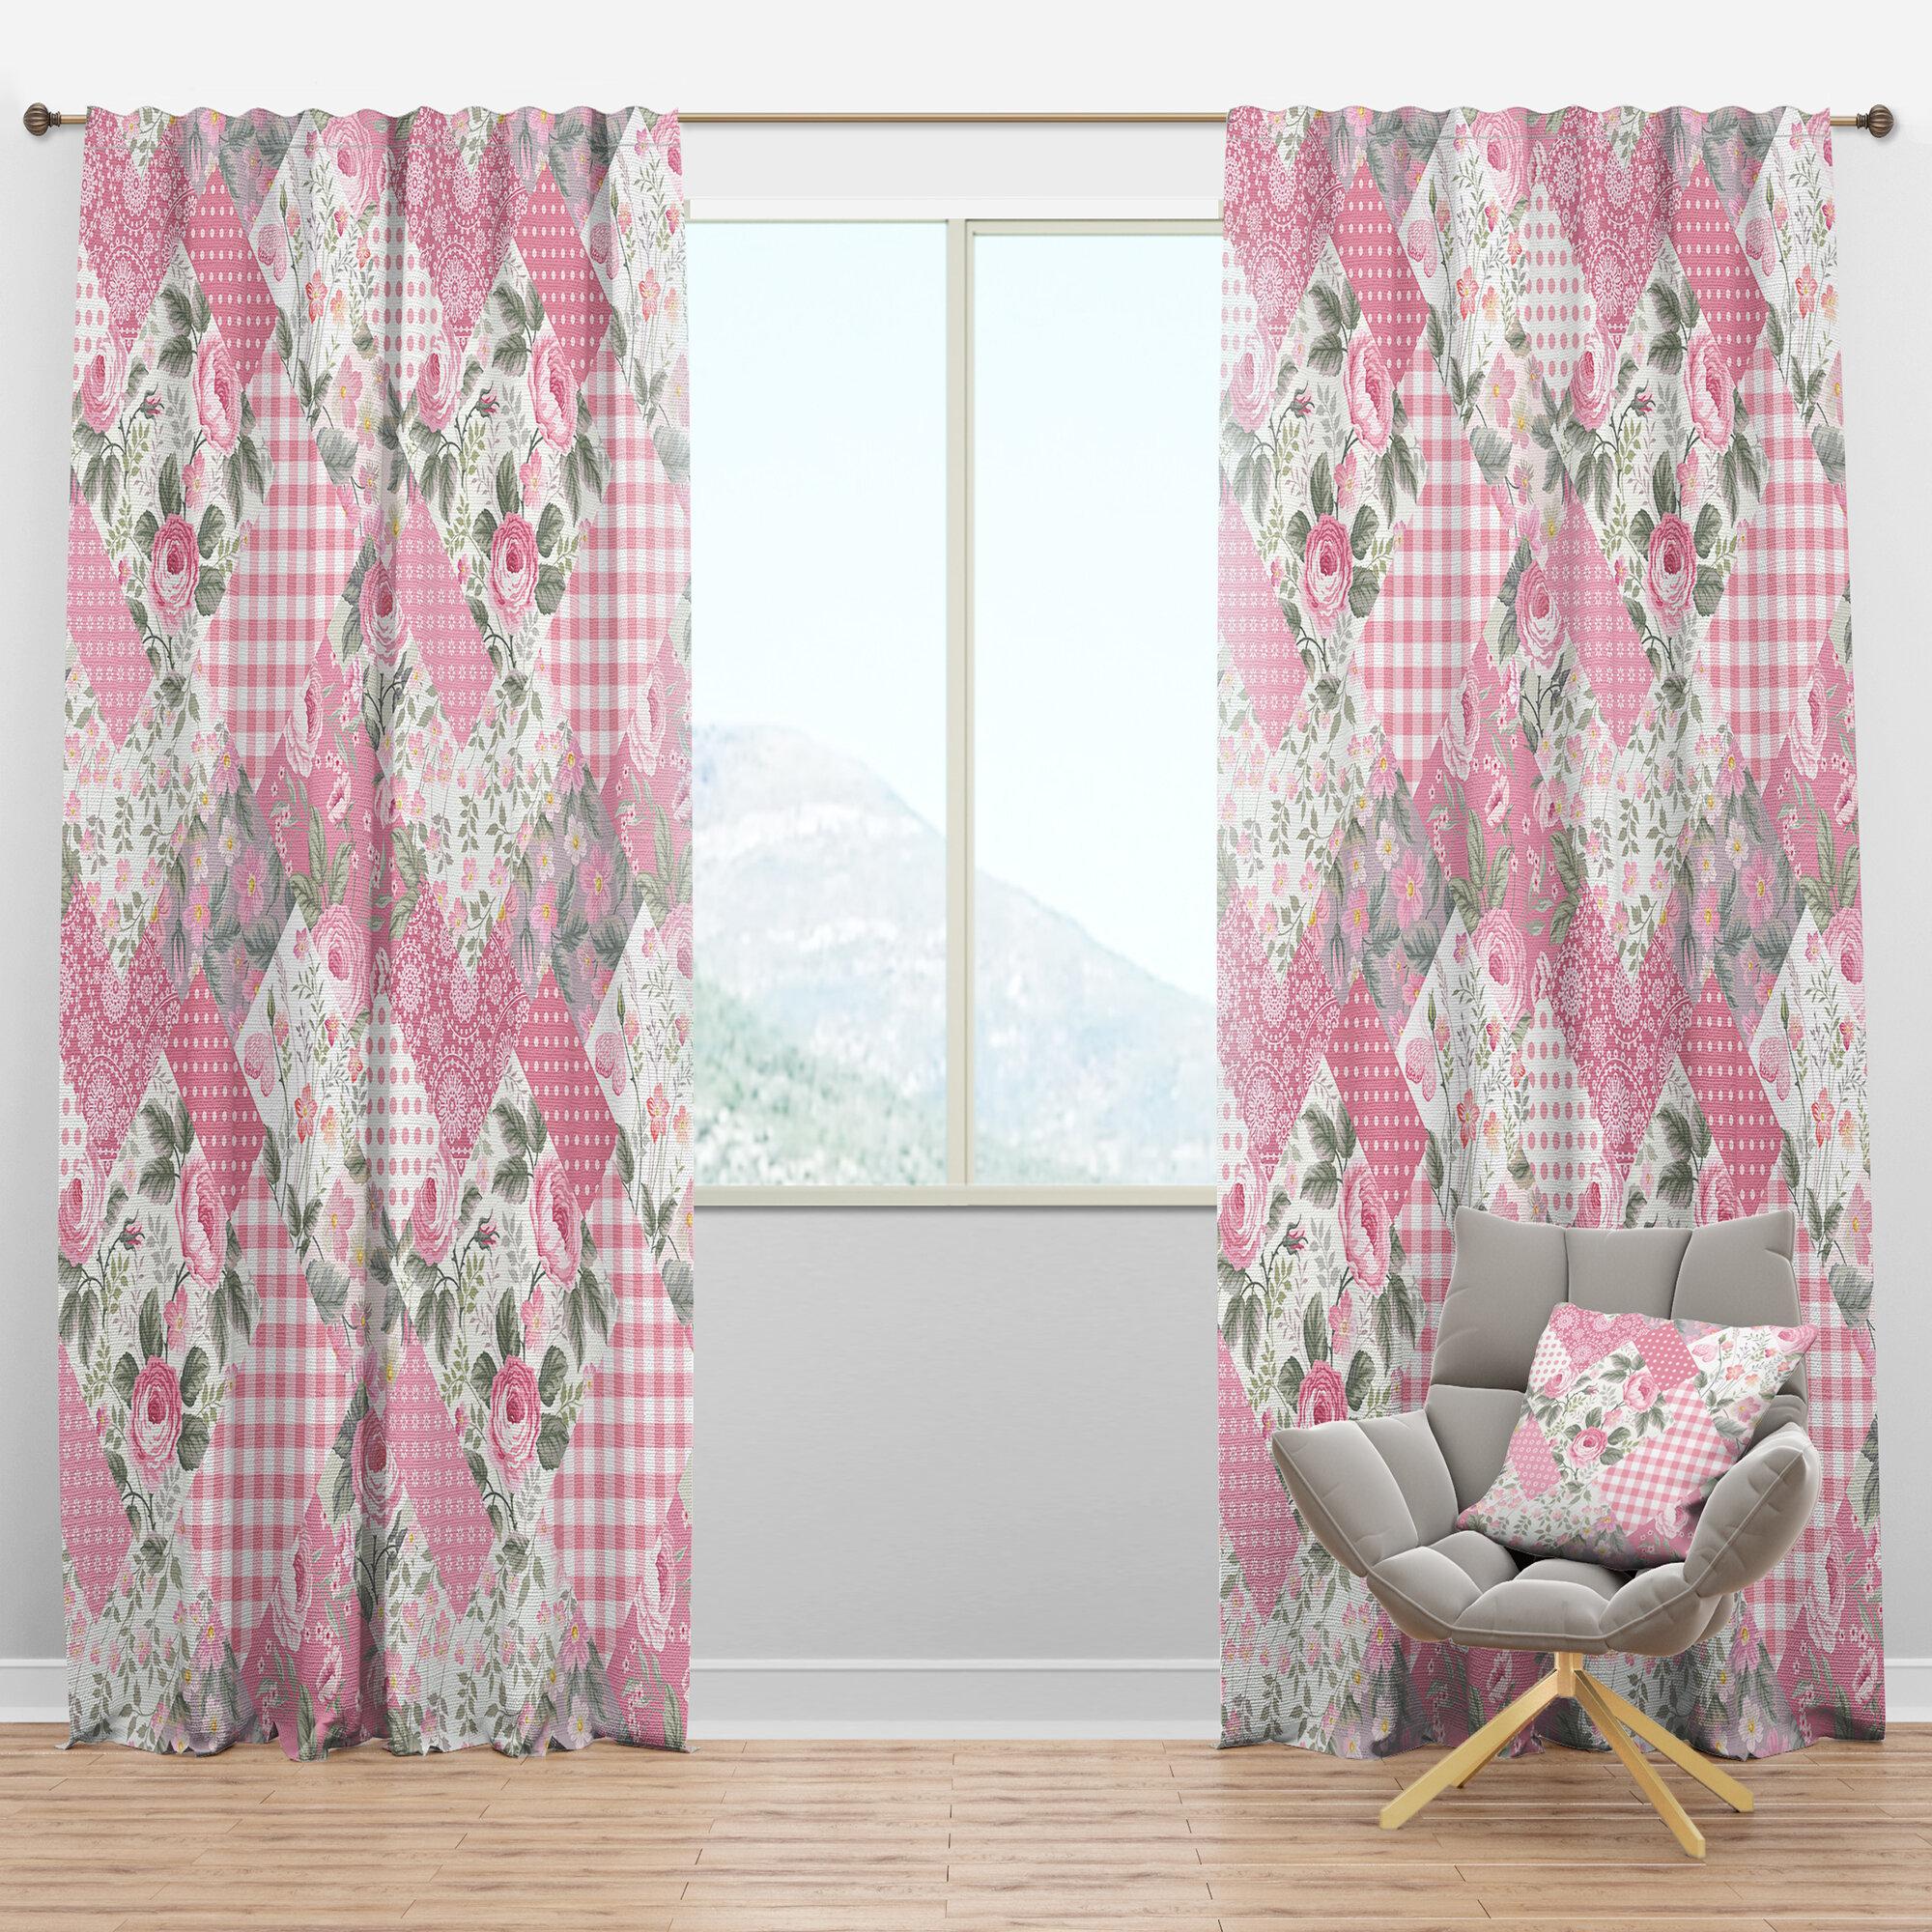 Designart Decorative Floral Semi Sheer Thermal Rod Pocket Curtain Panel Wayfair